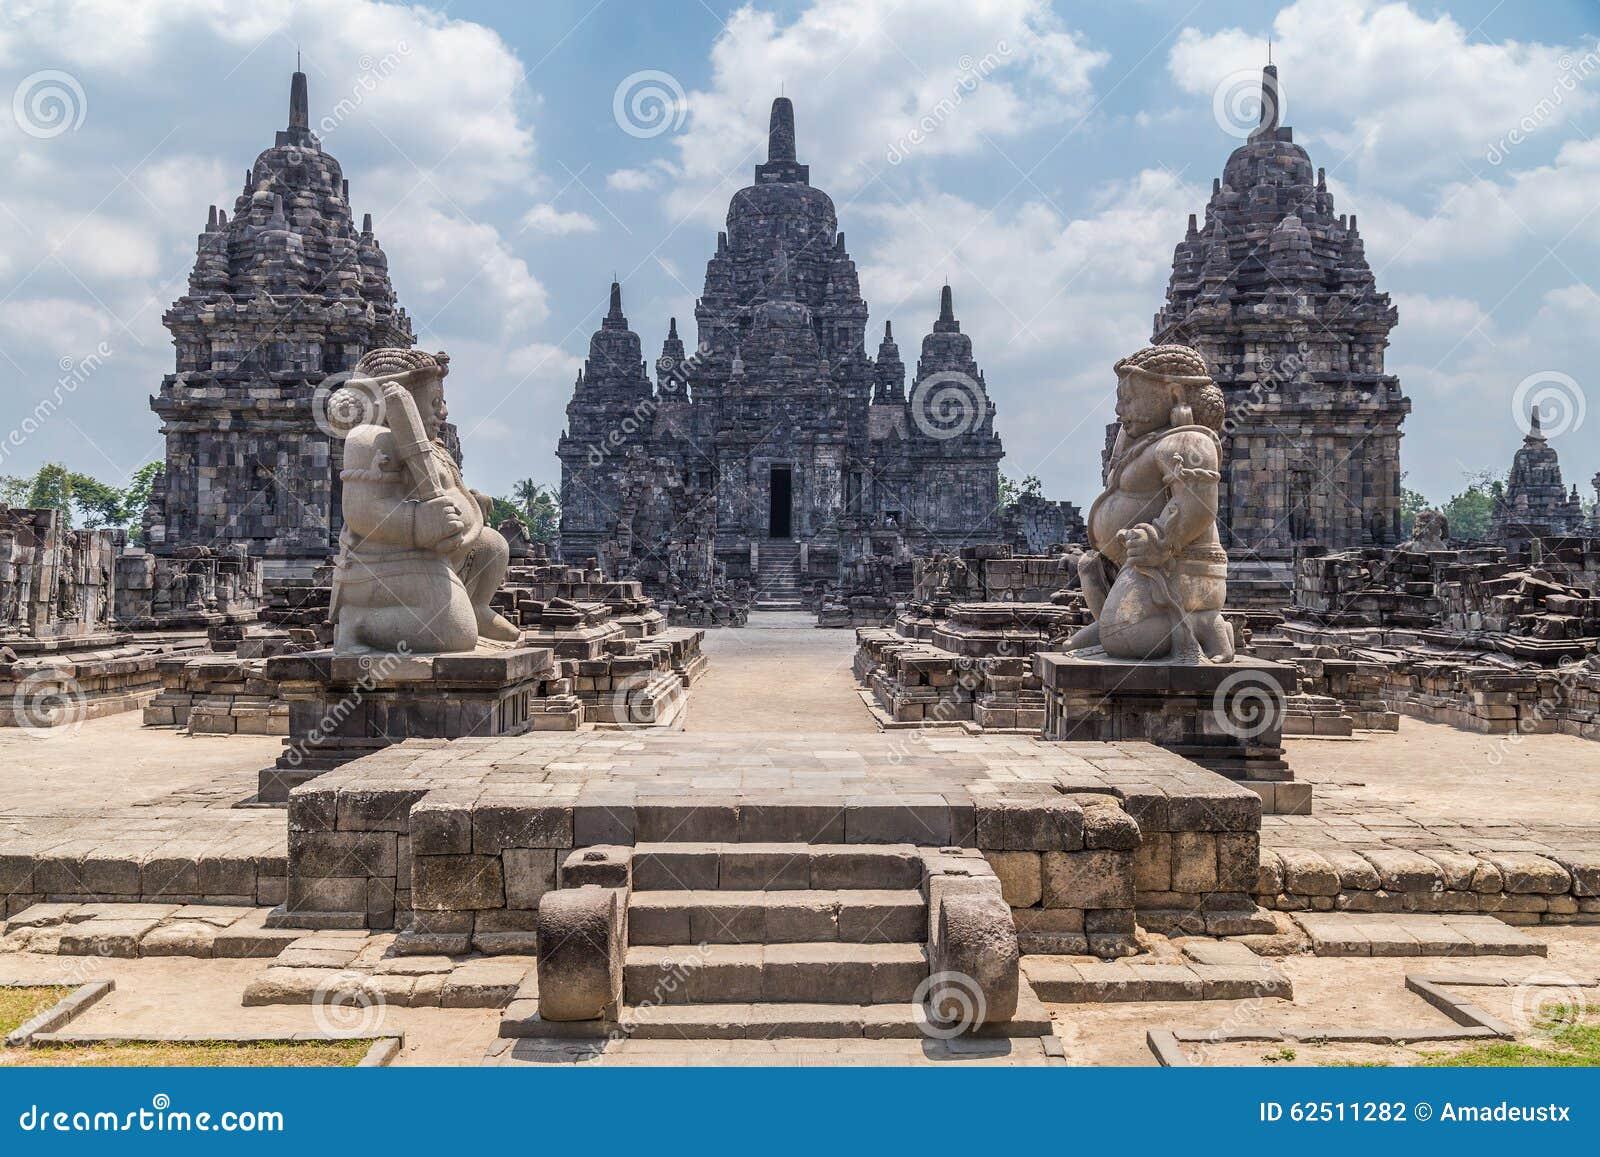 Candi Sewu, pieza del templo hindú de Prambanan, Indonesia